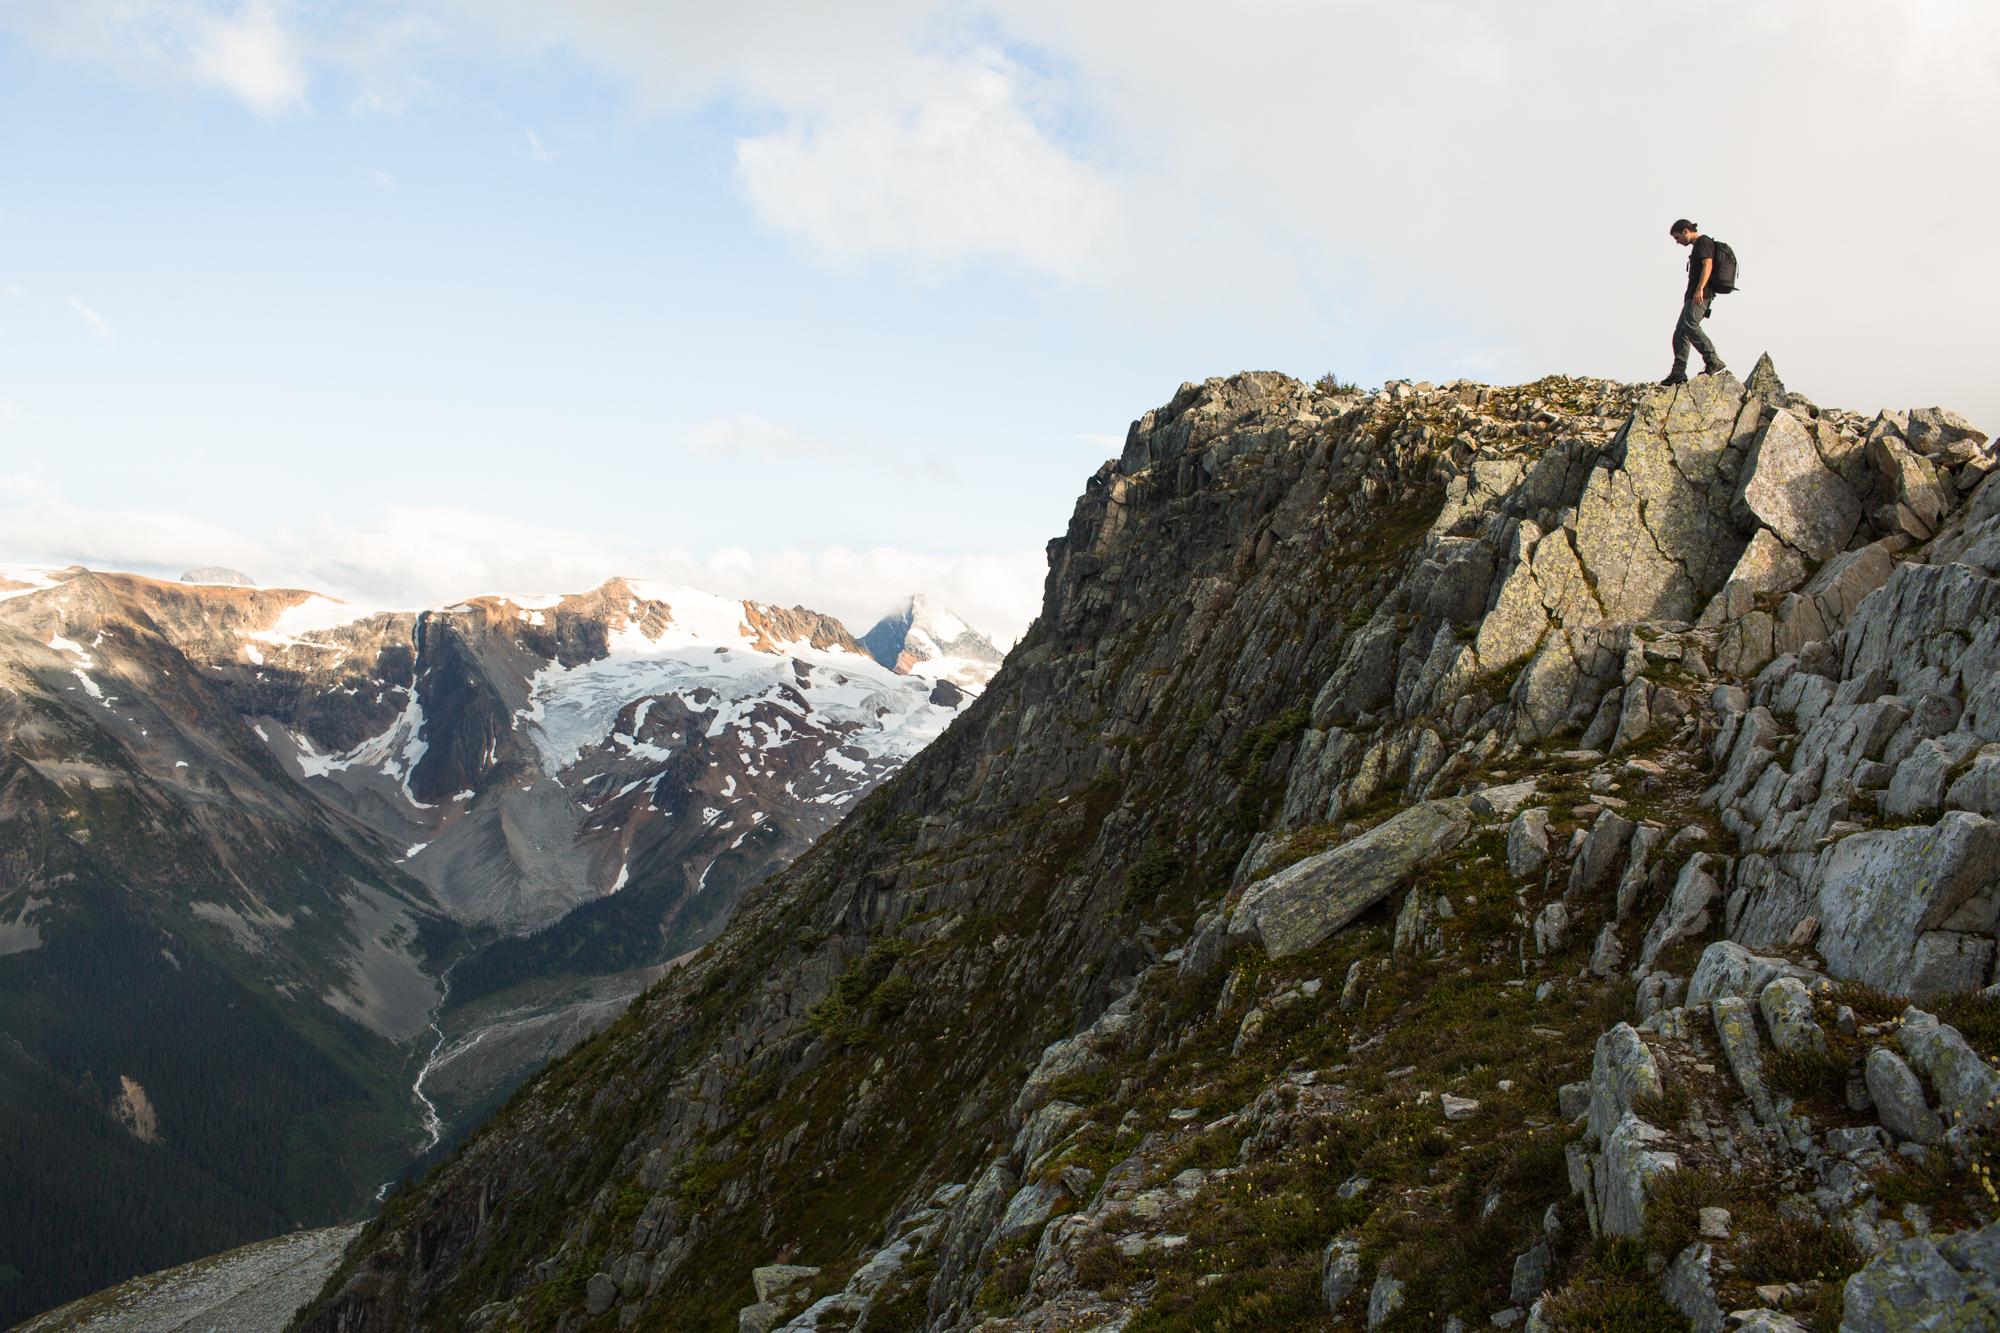 20-Bec_Kilpatrick_Photography_Canada31Andrew_Pavlidis_Photography_Tourism_Golden_Glacier-8424